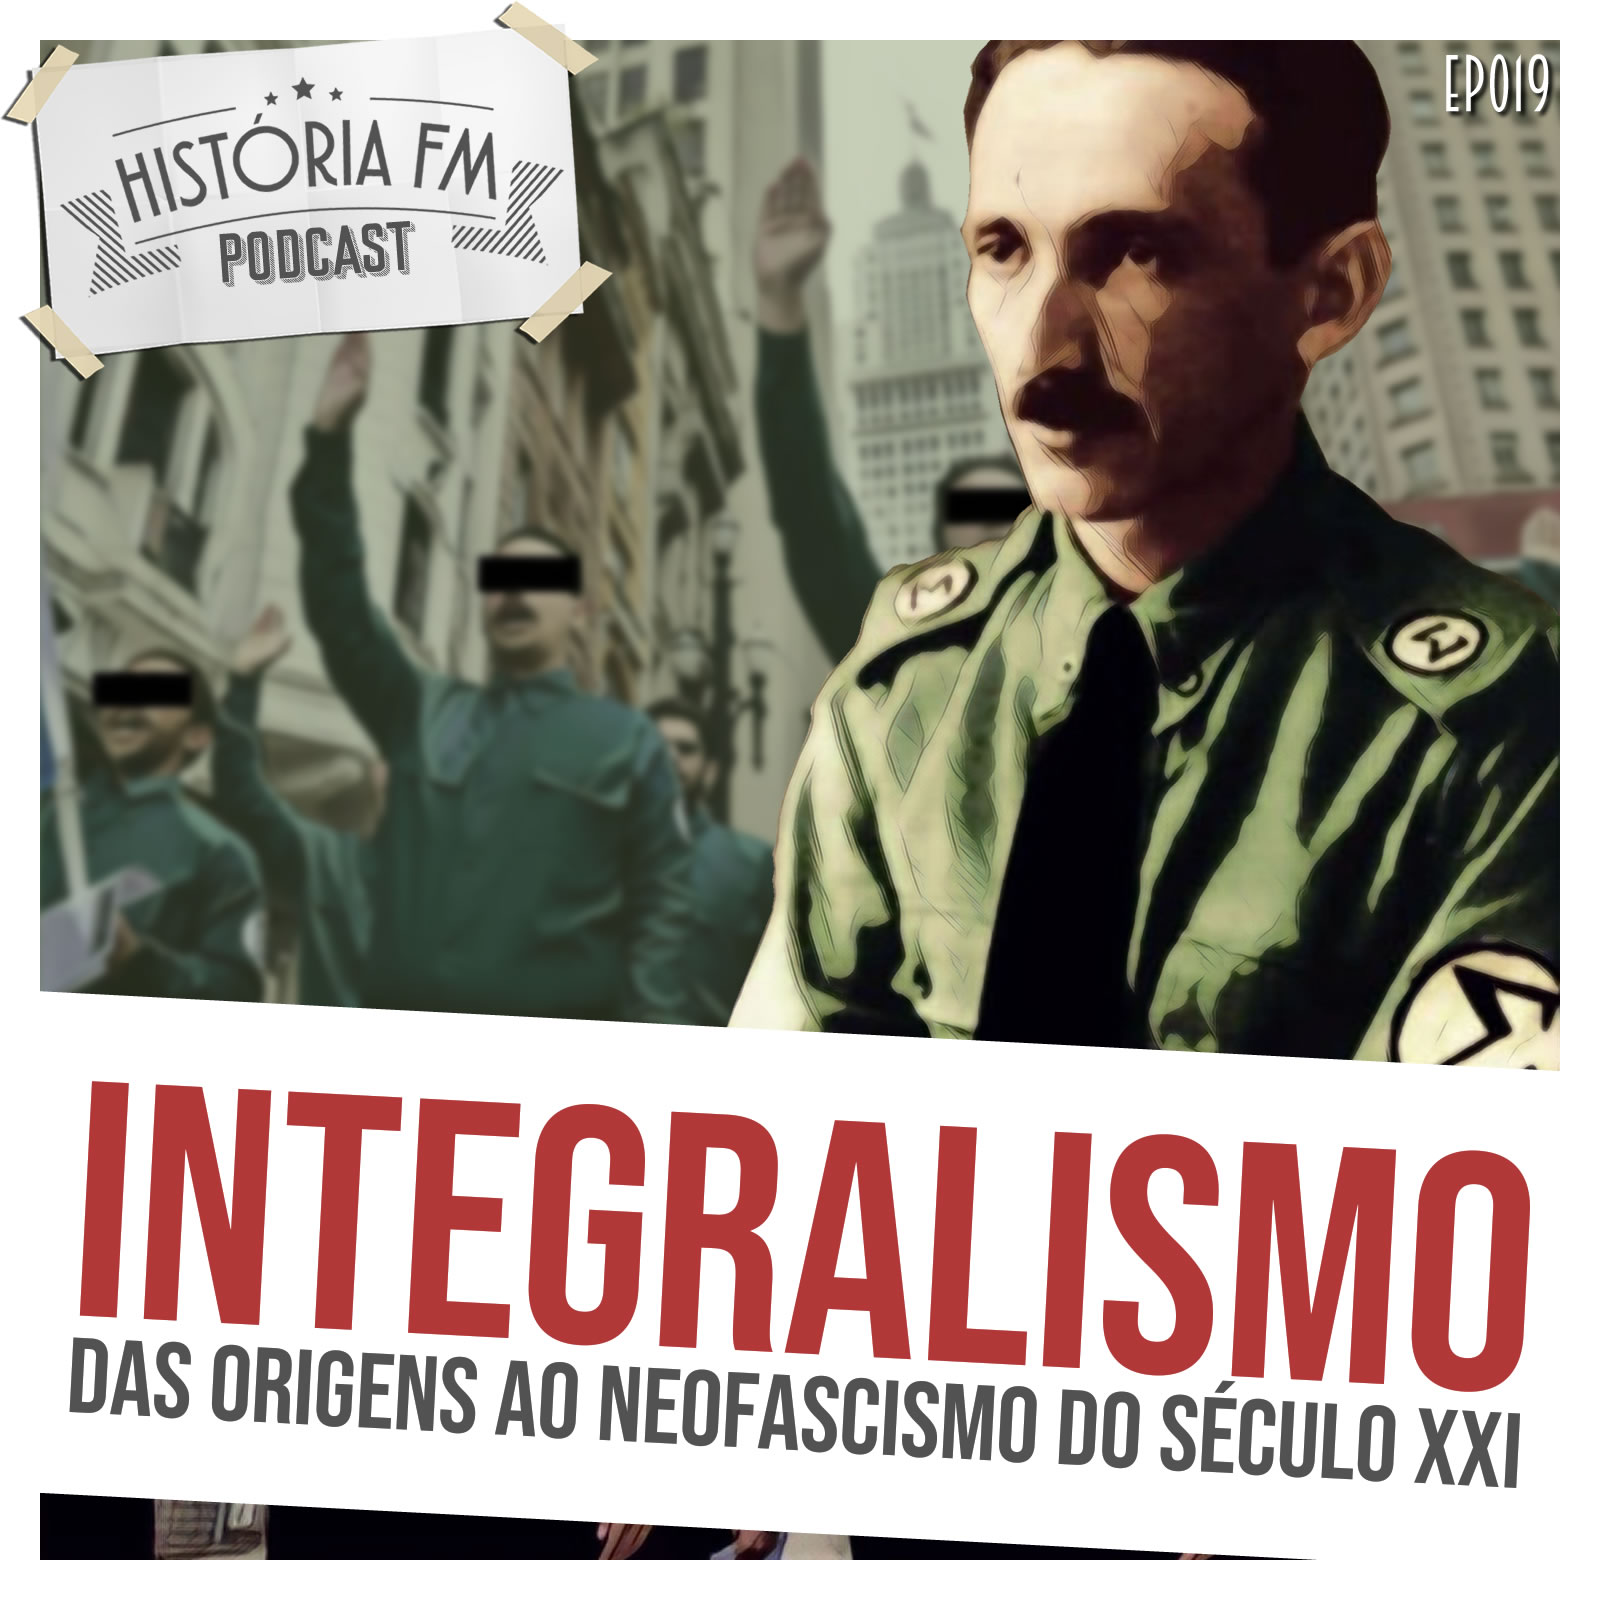 integralismo